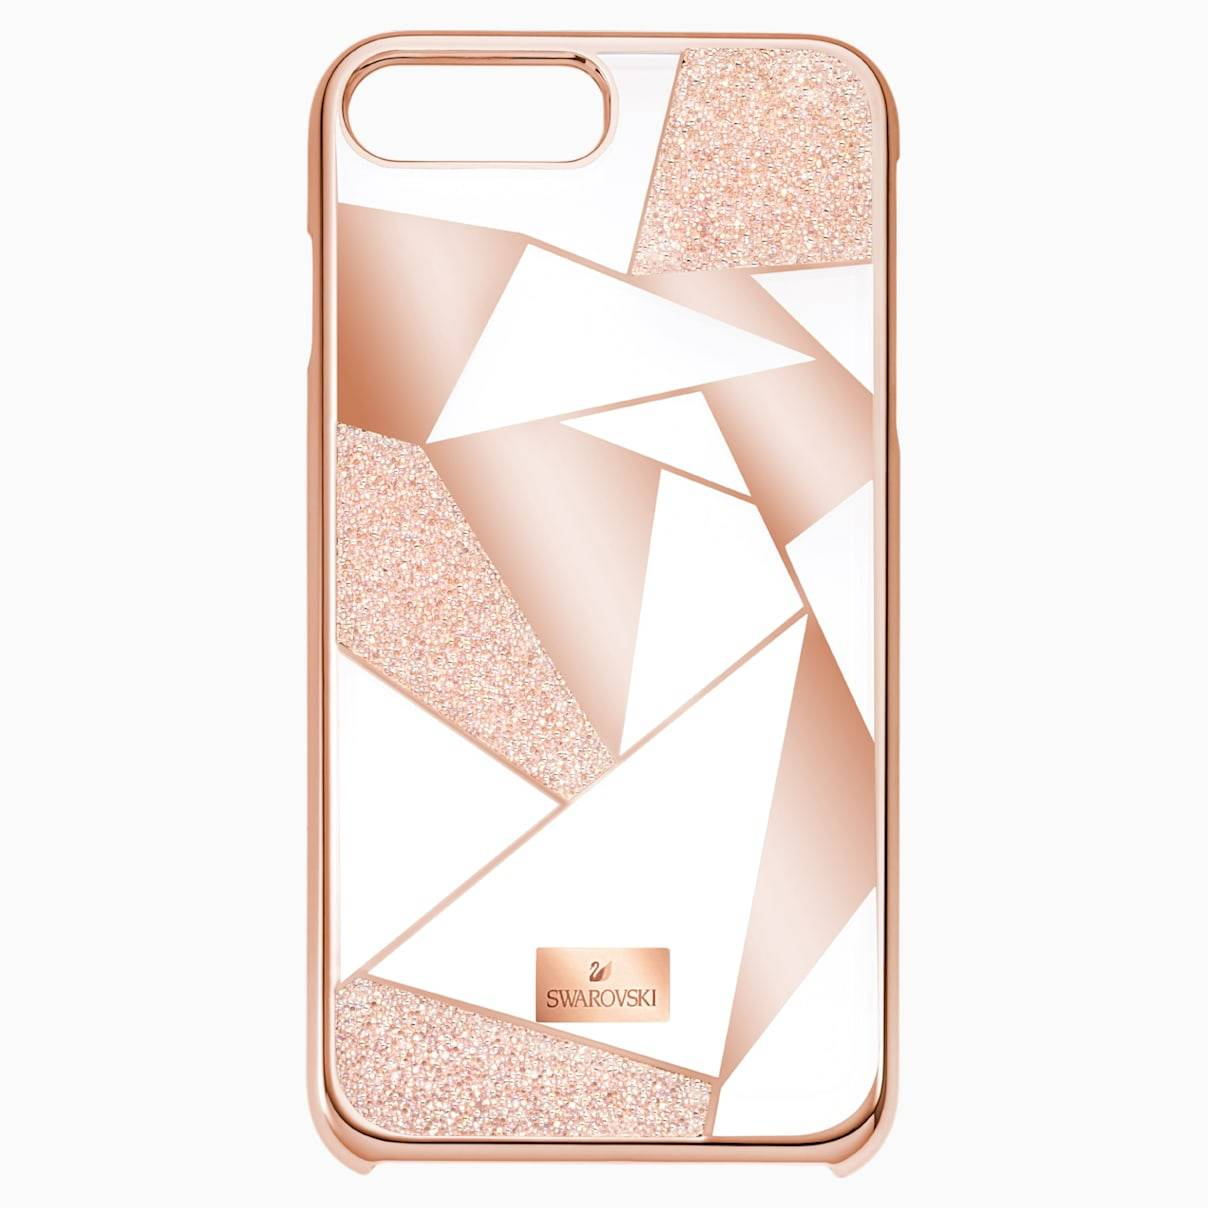 Swarovski Heroism Smartphone Case with Bumper, iPhone® 8, Pink